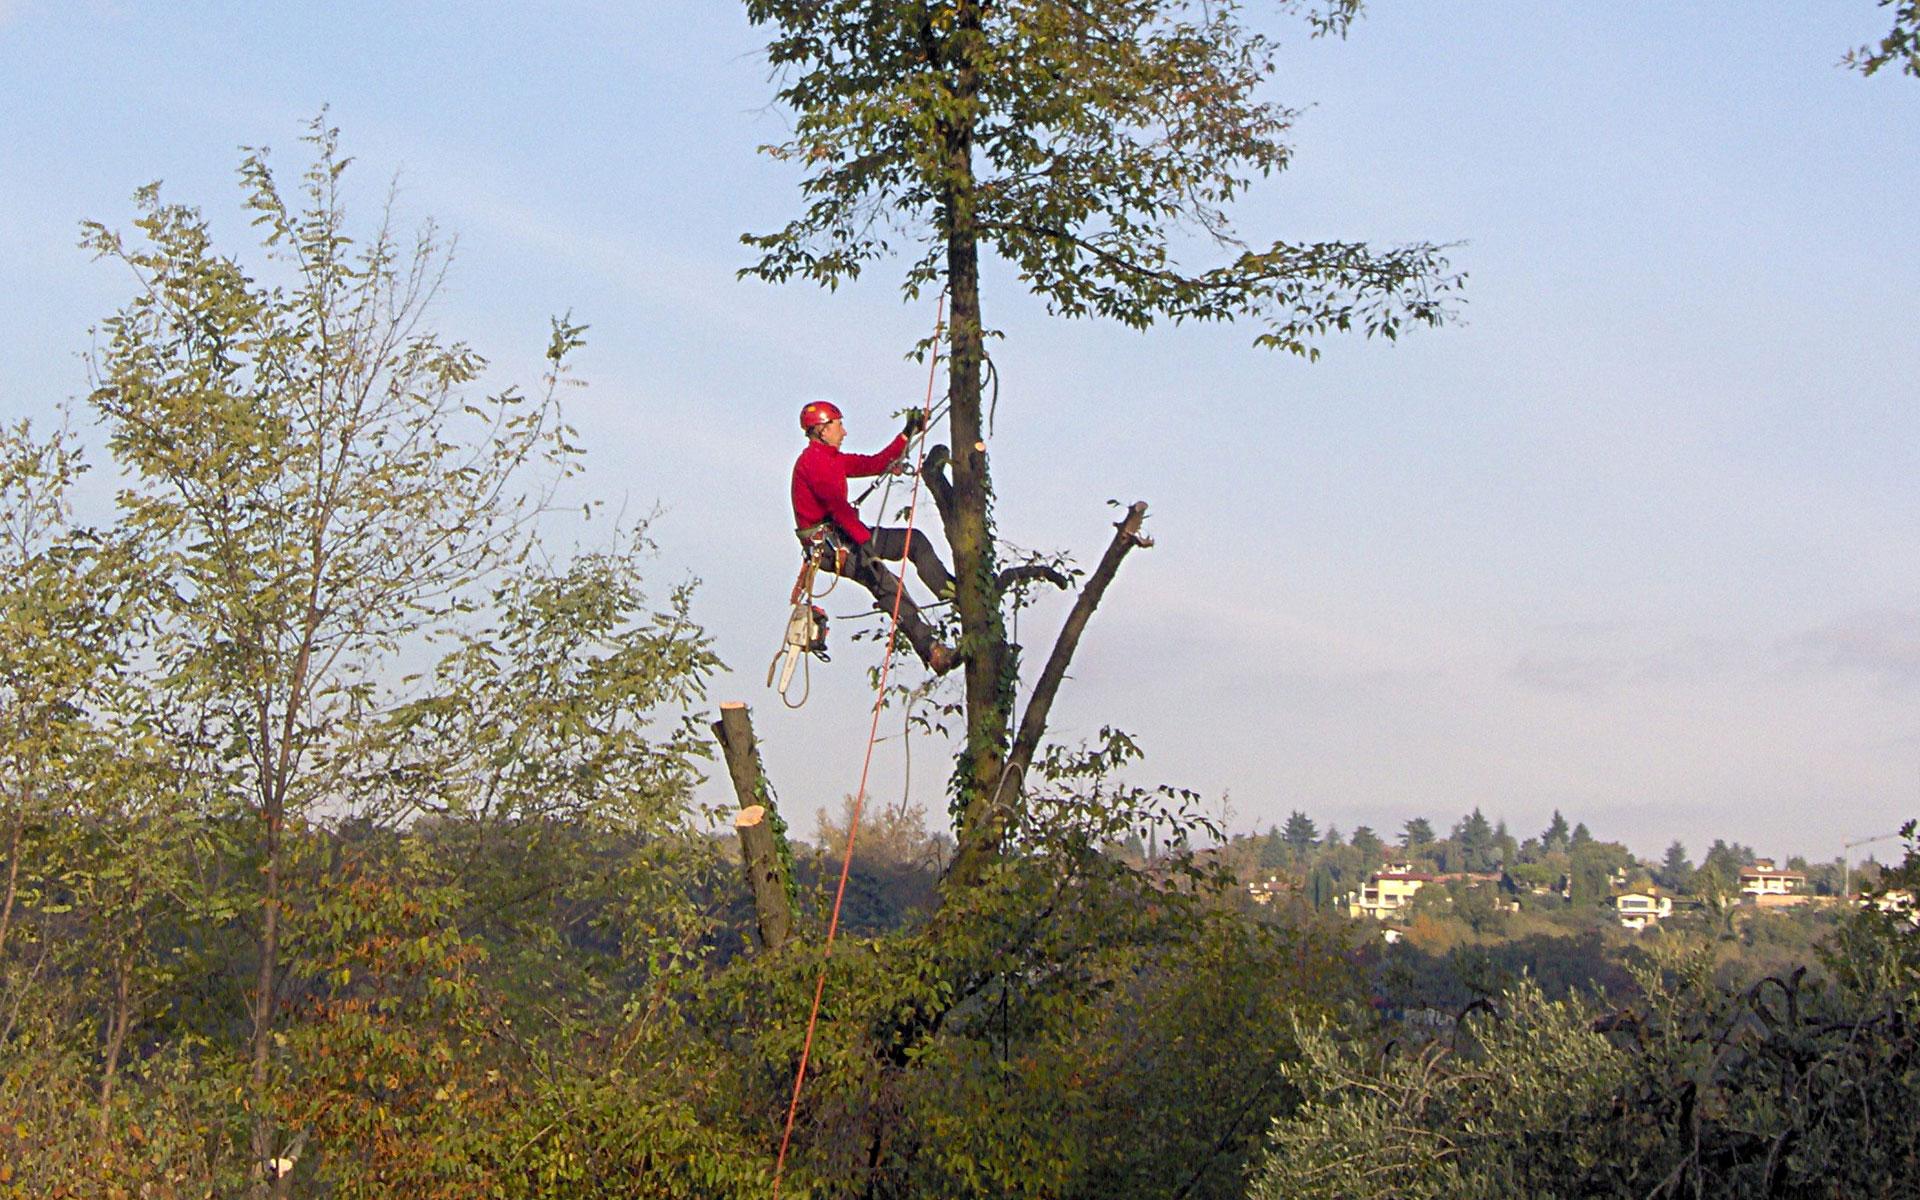 https://www.leforbici.eu/wp-content/uploads/2019/12/forbici-tree-climbing-potatura-alberi-lago-garda.jpg